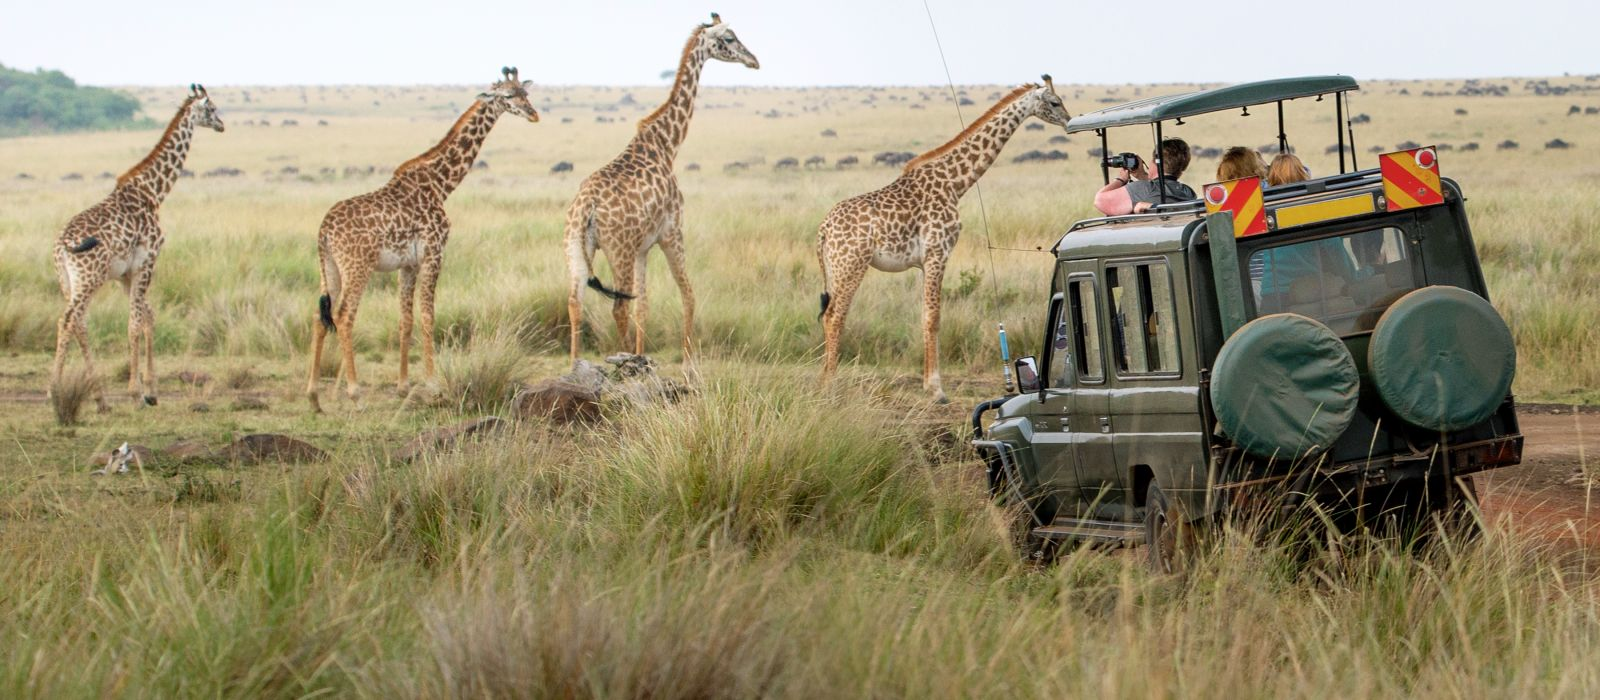 Giraffenherde in der Savanne, Kenia, Afrika